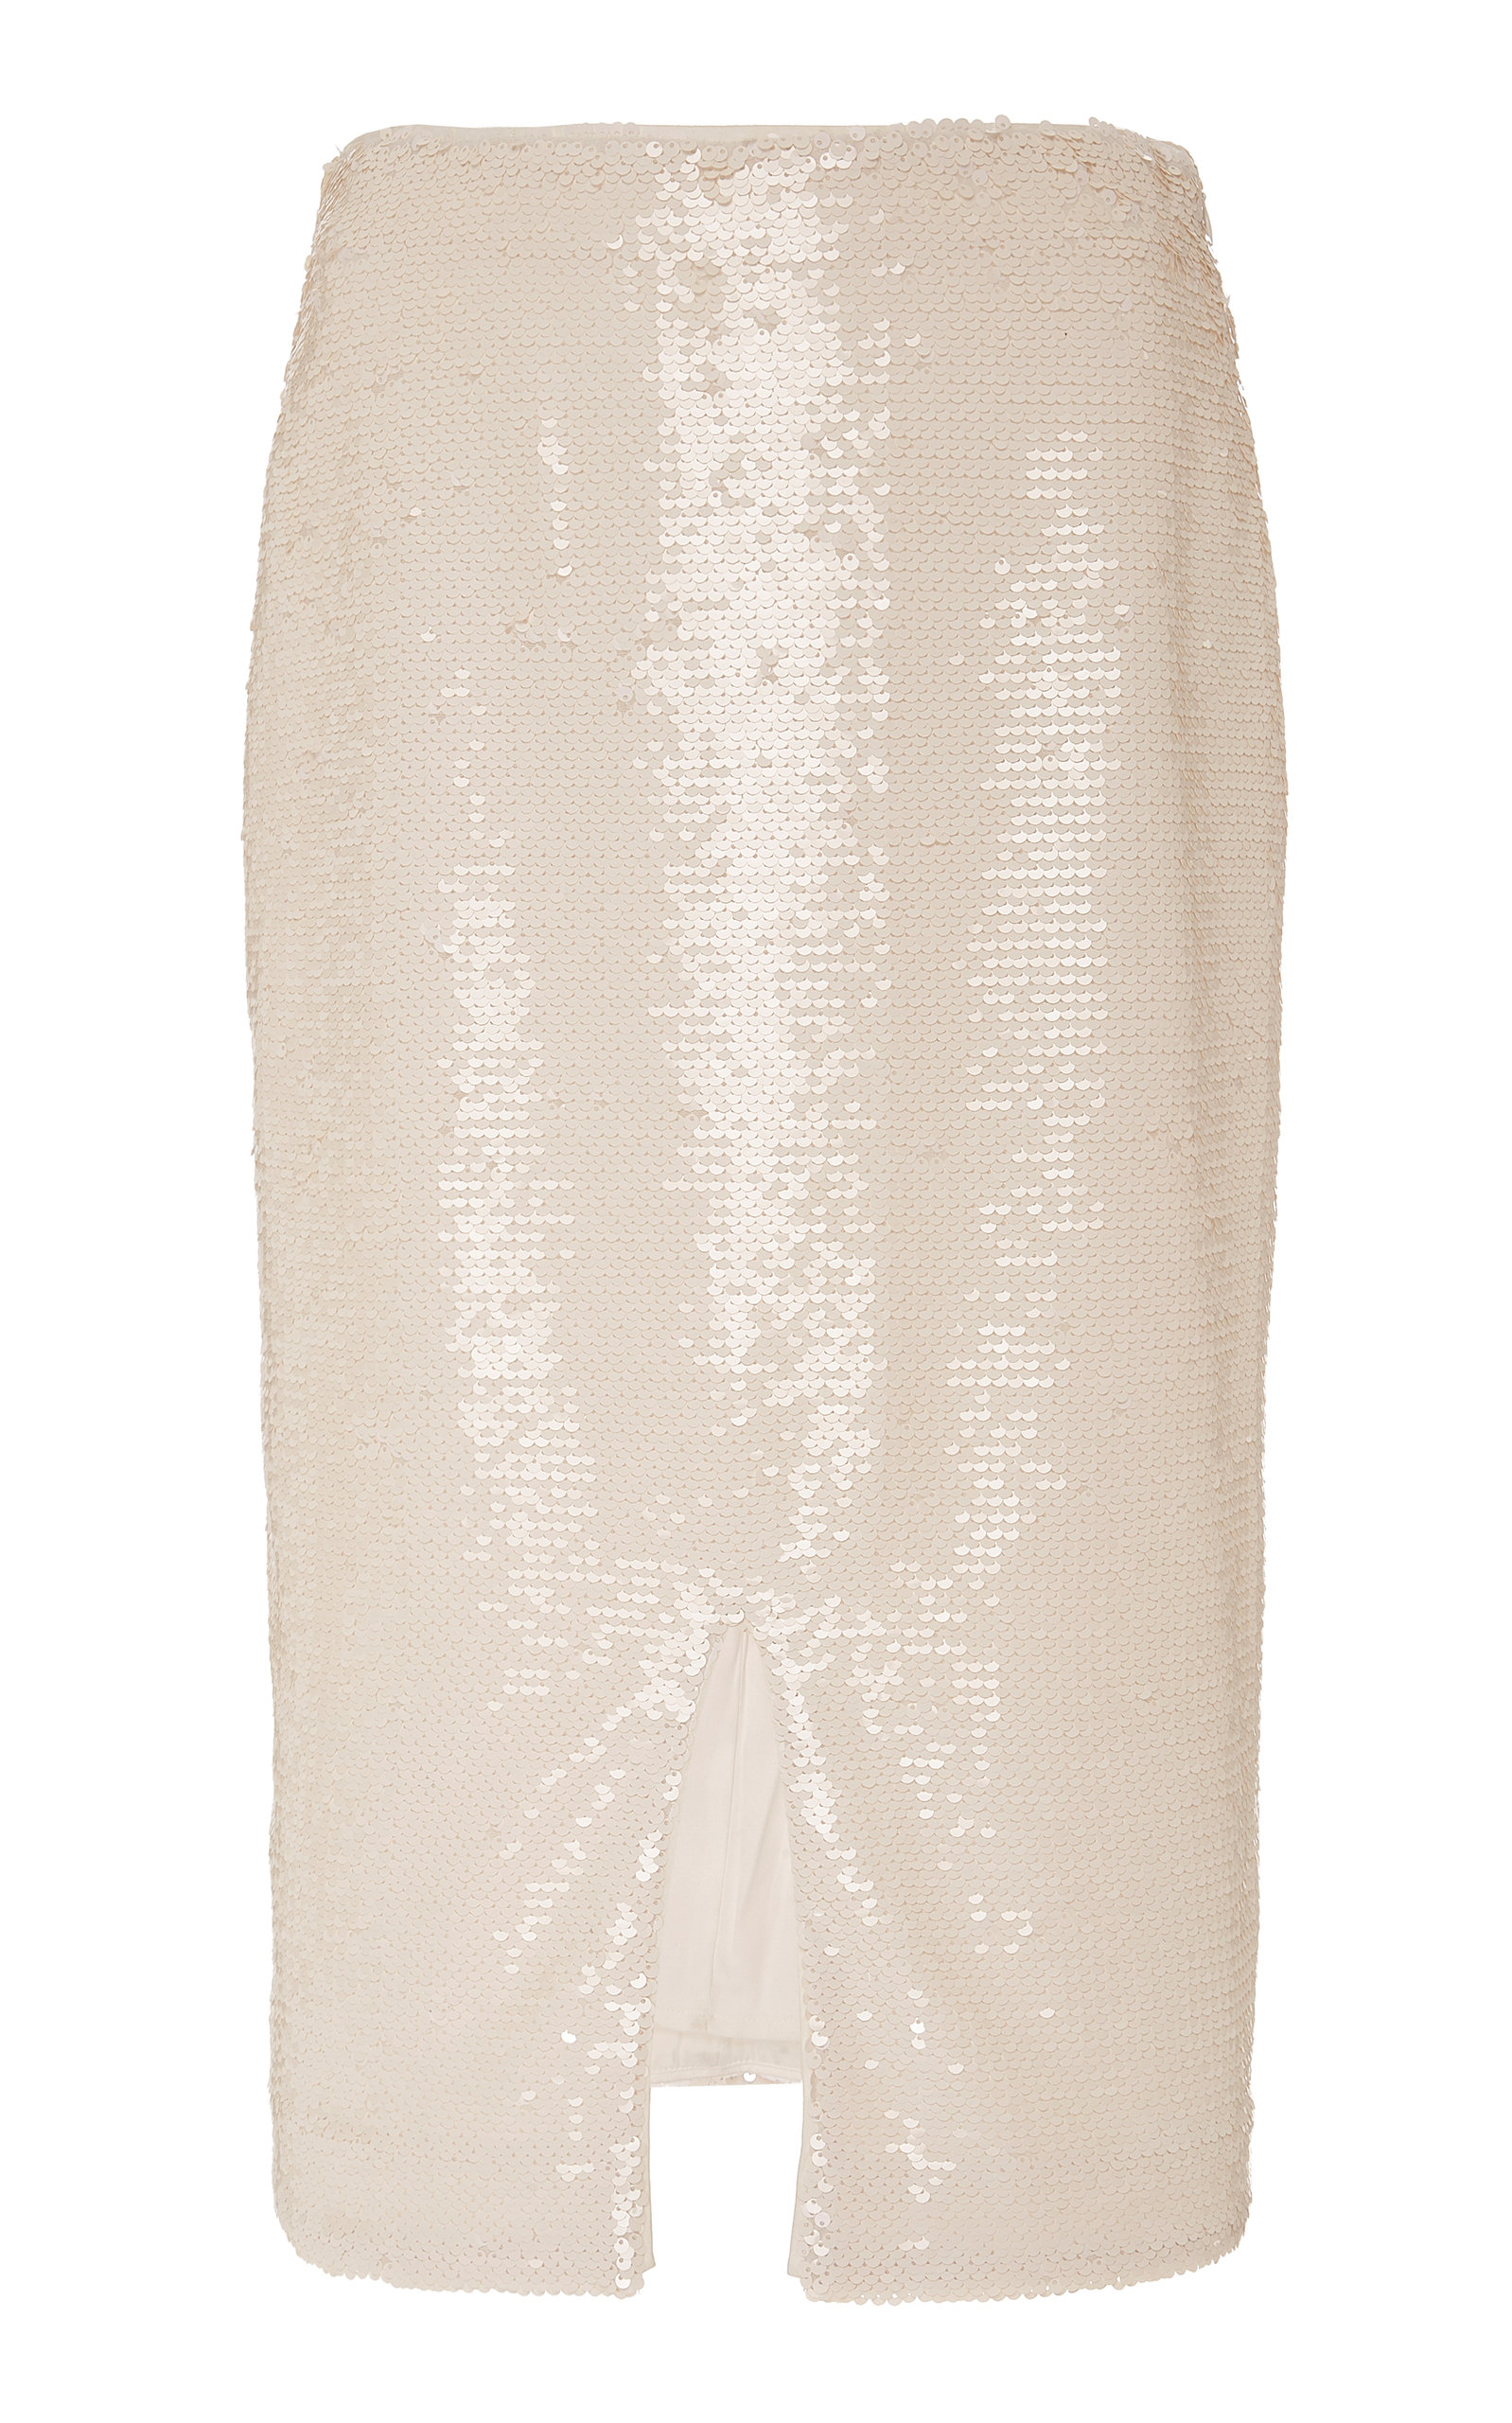 Ganni Skirts SEQUINED CHIFFON SKIRT